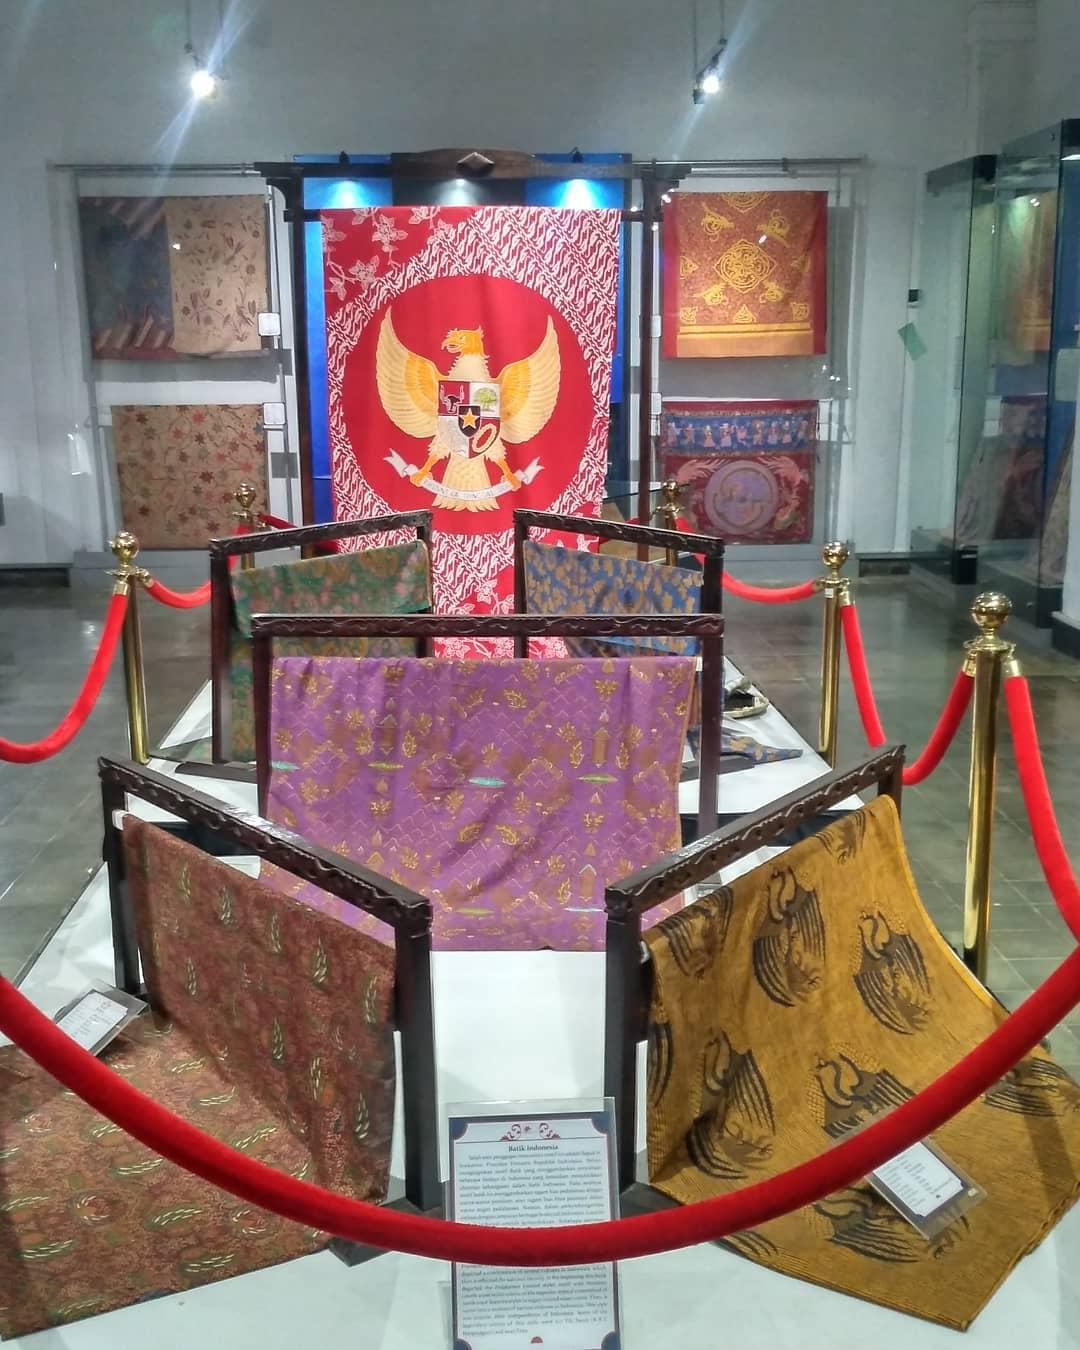 Koleksi Barang di Monumen Pancasila Sakti